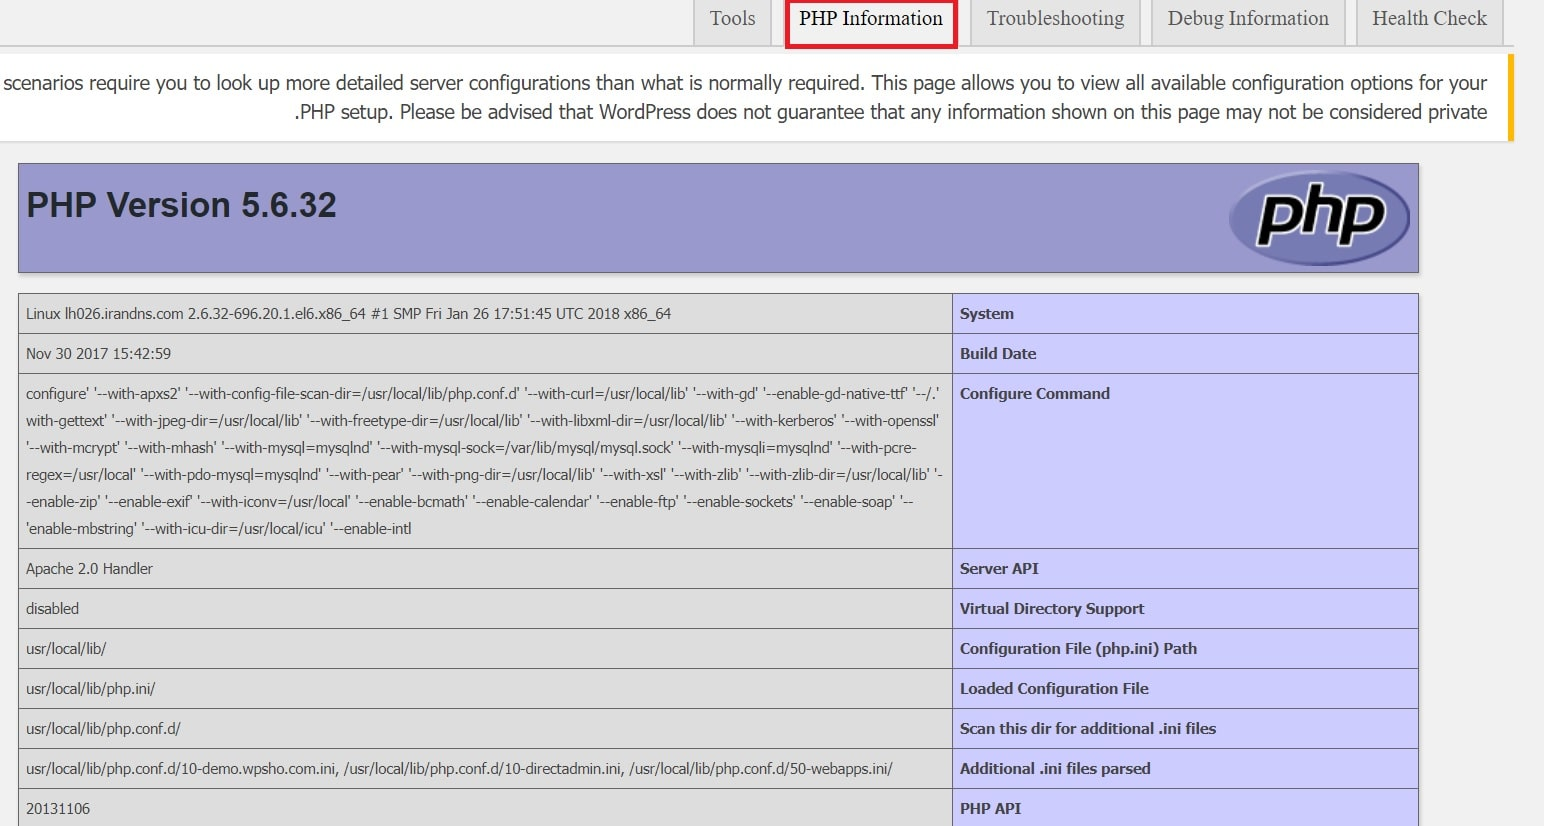 تب php information